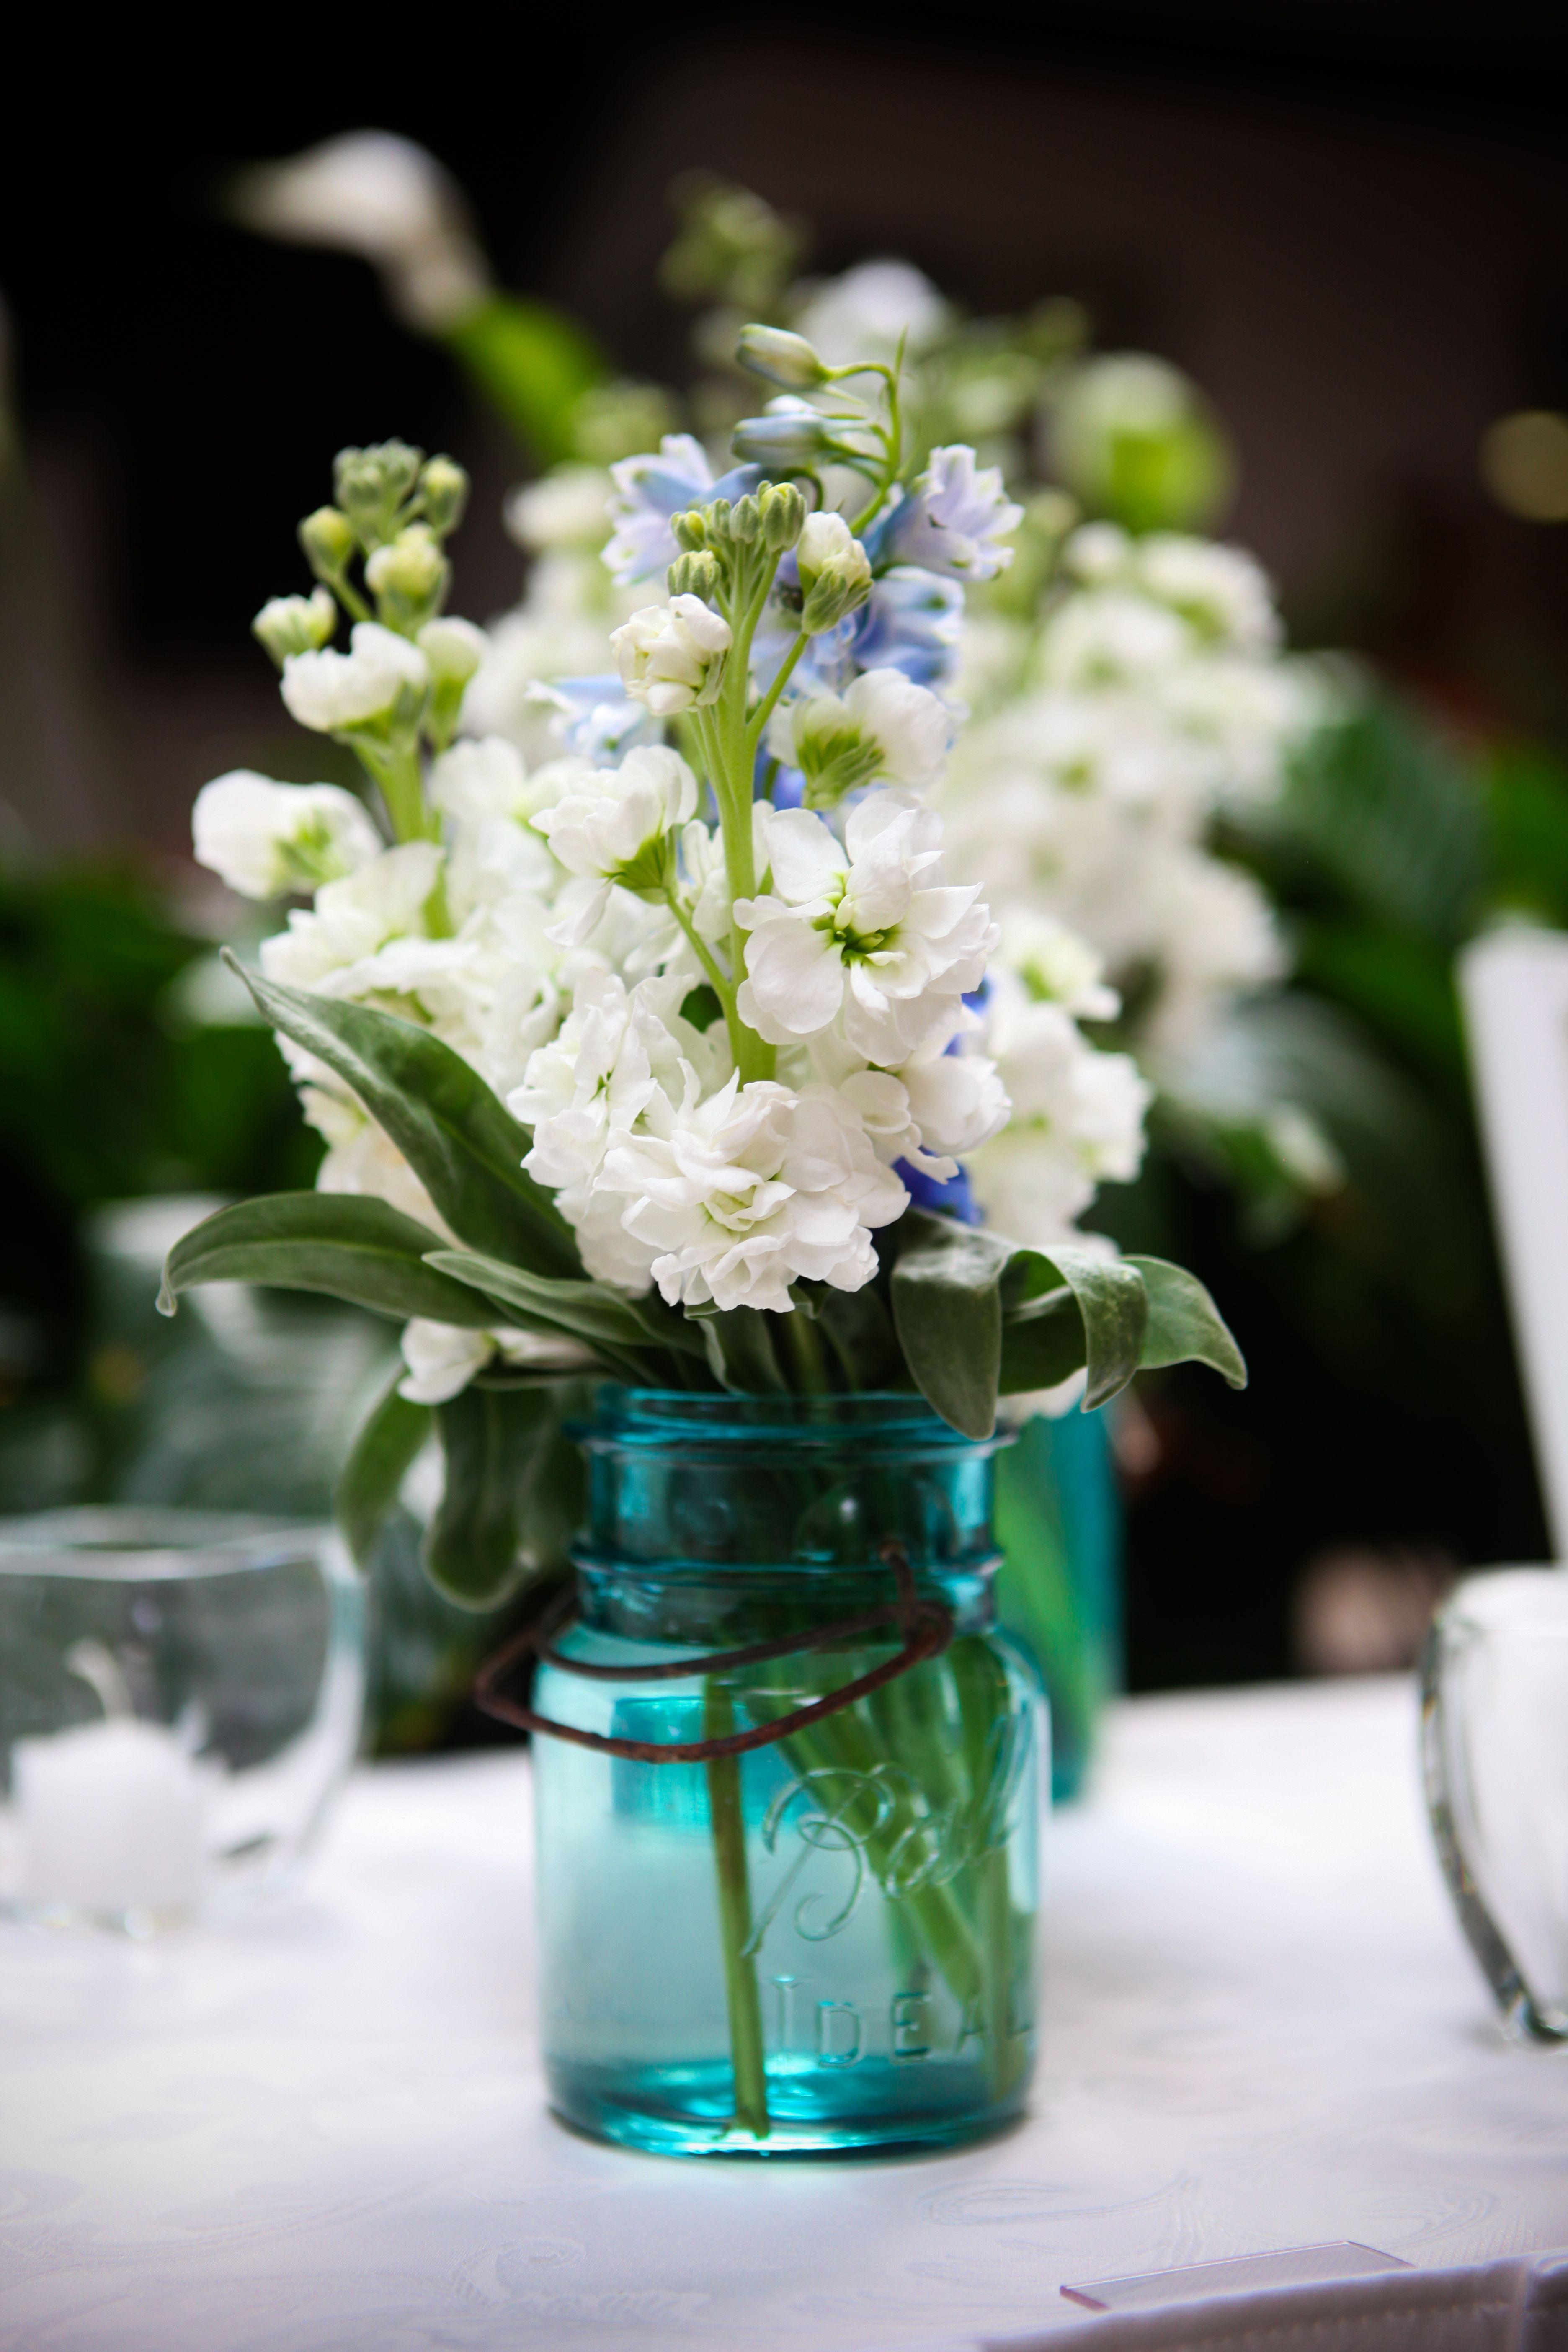 Pinterest & Obsessed with blue mason jars :)   Things I Love   Blue mason jars ...